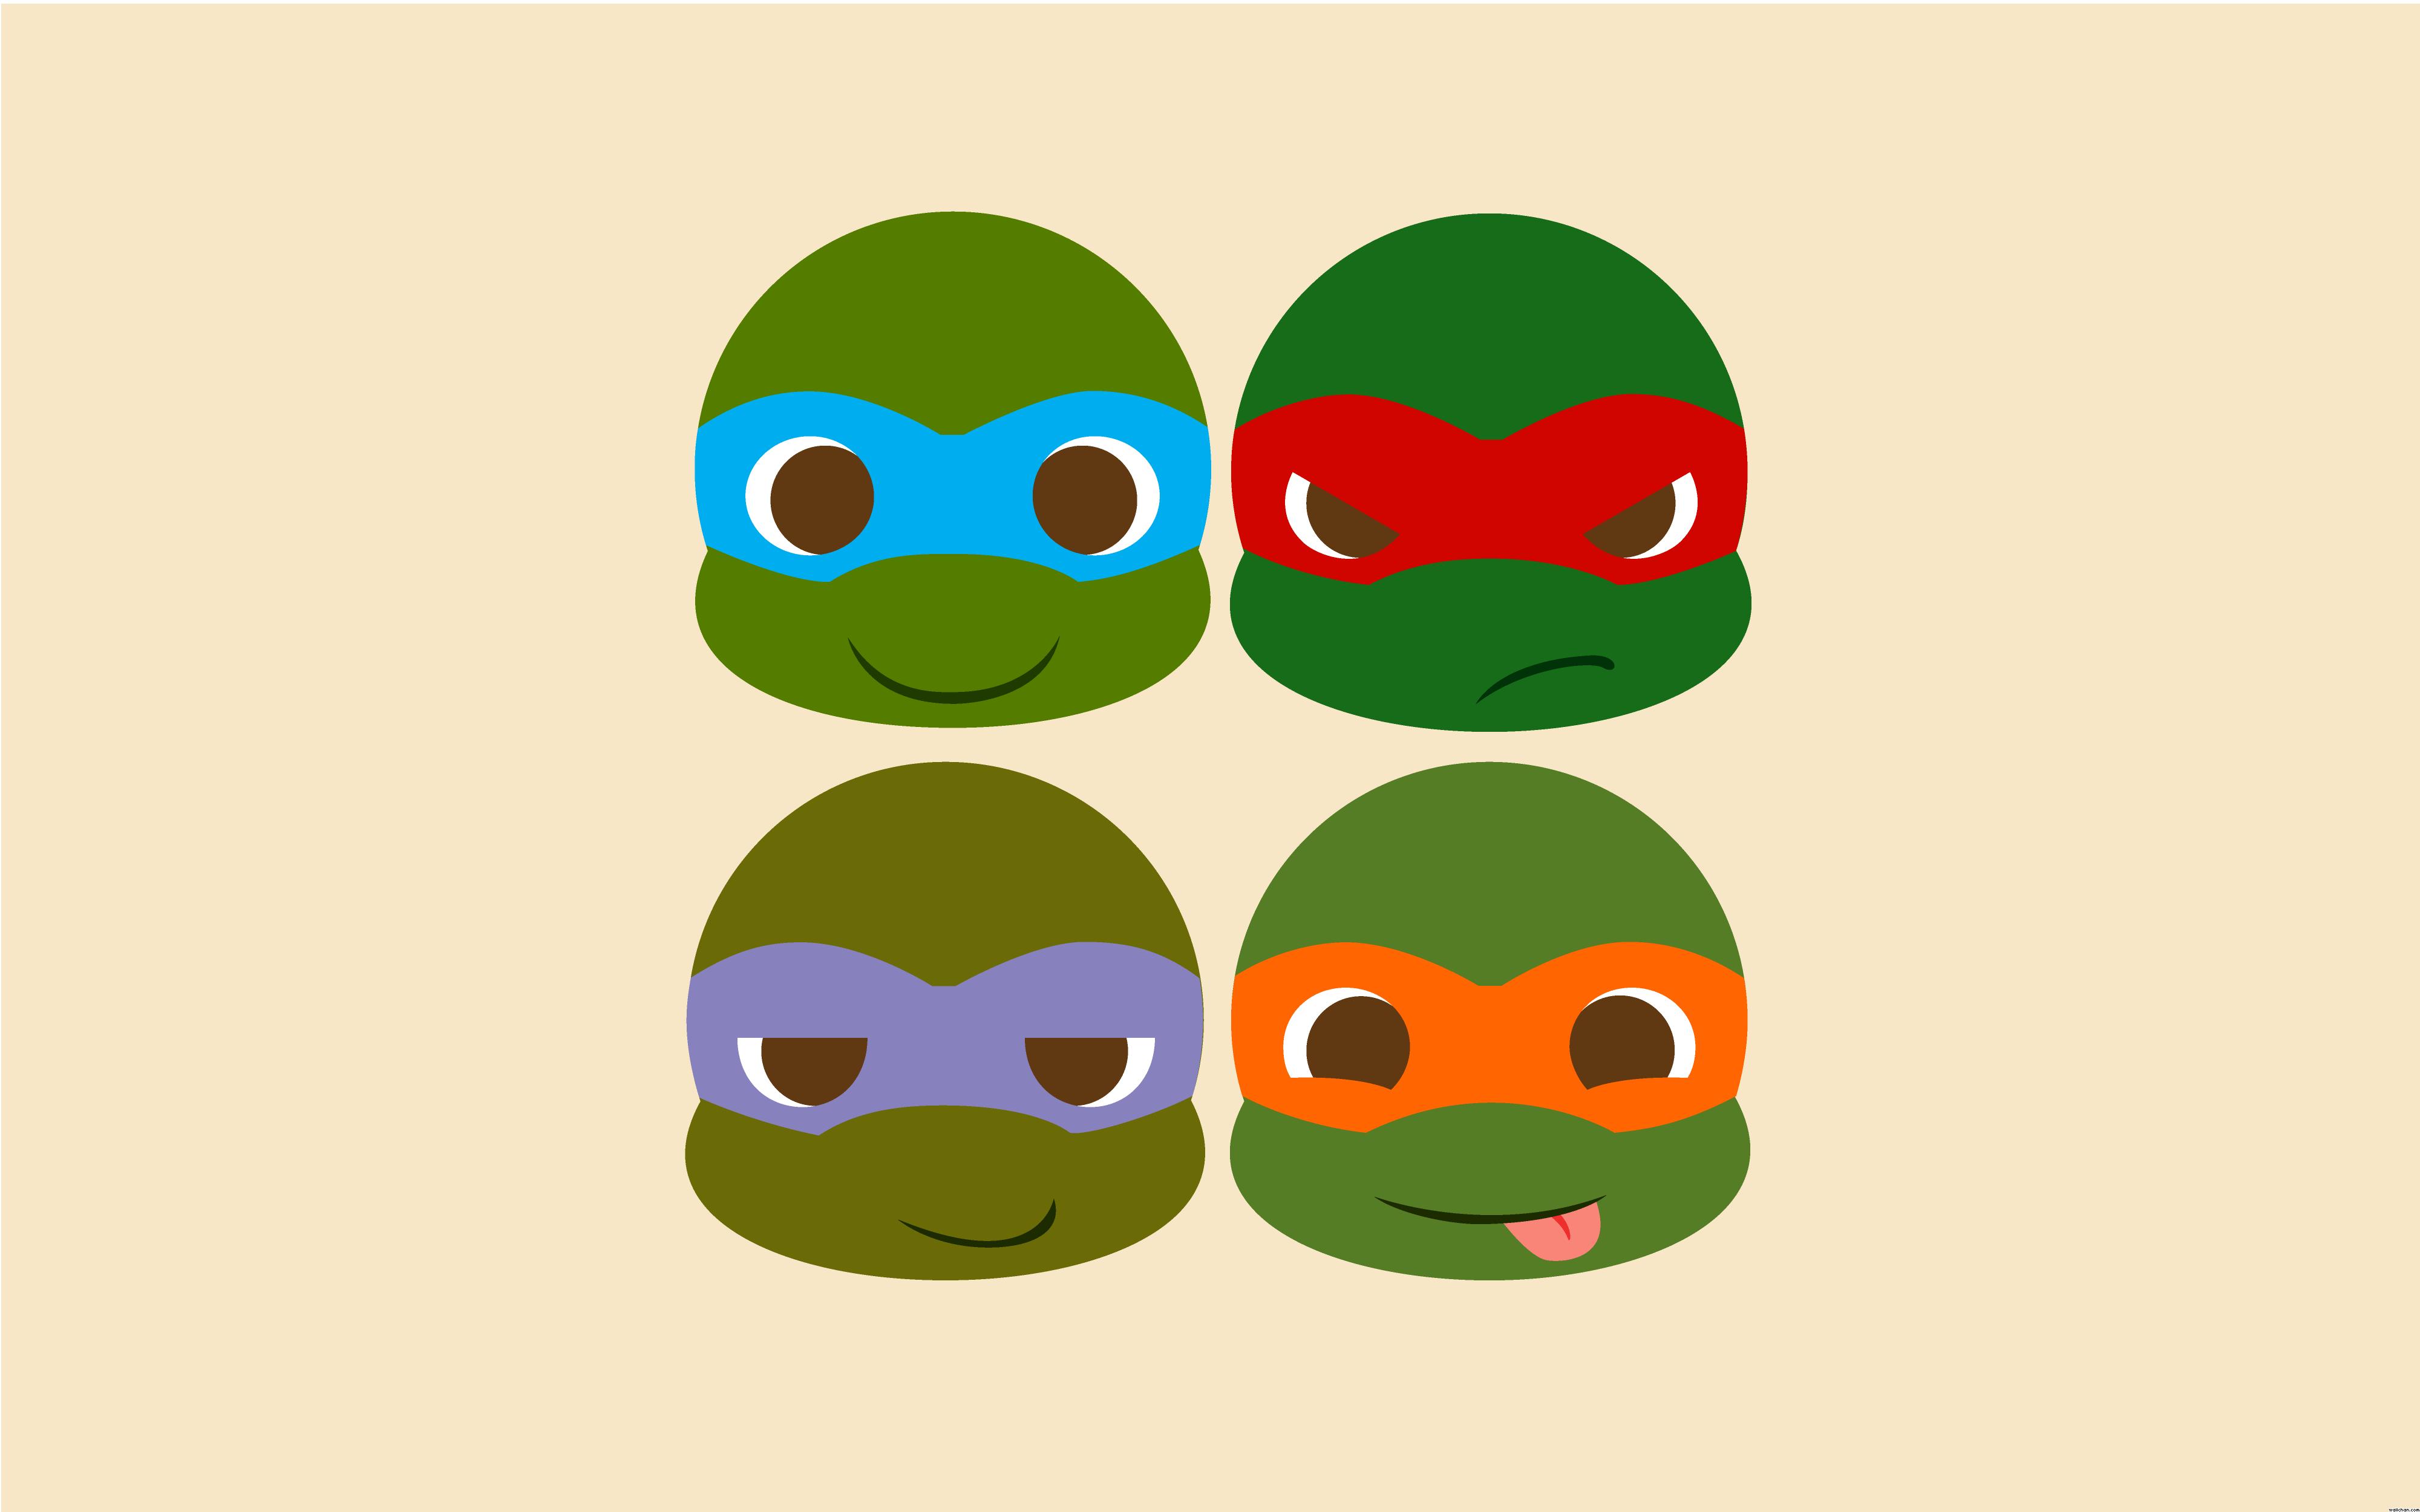 Cute Turtles Wallpapers - Wallpaper Cave